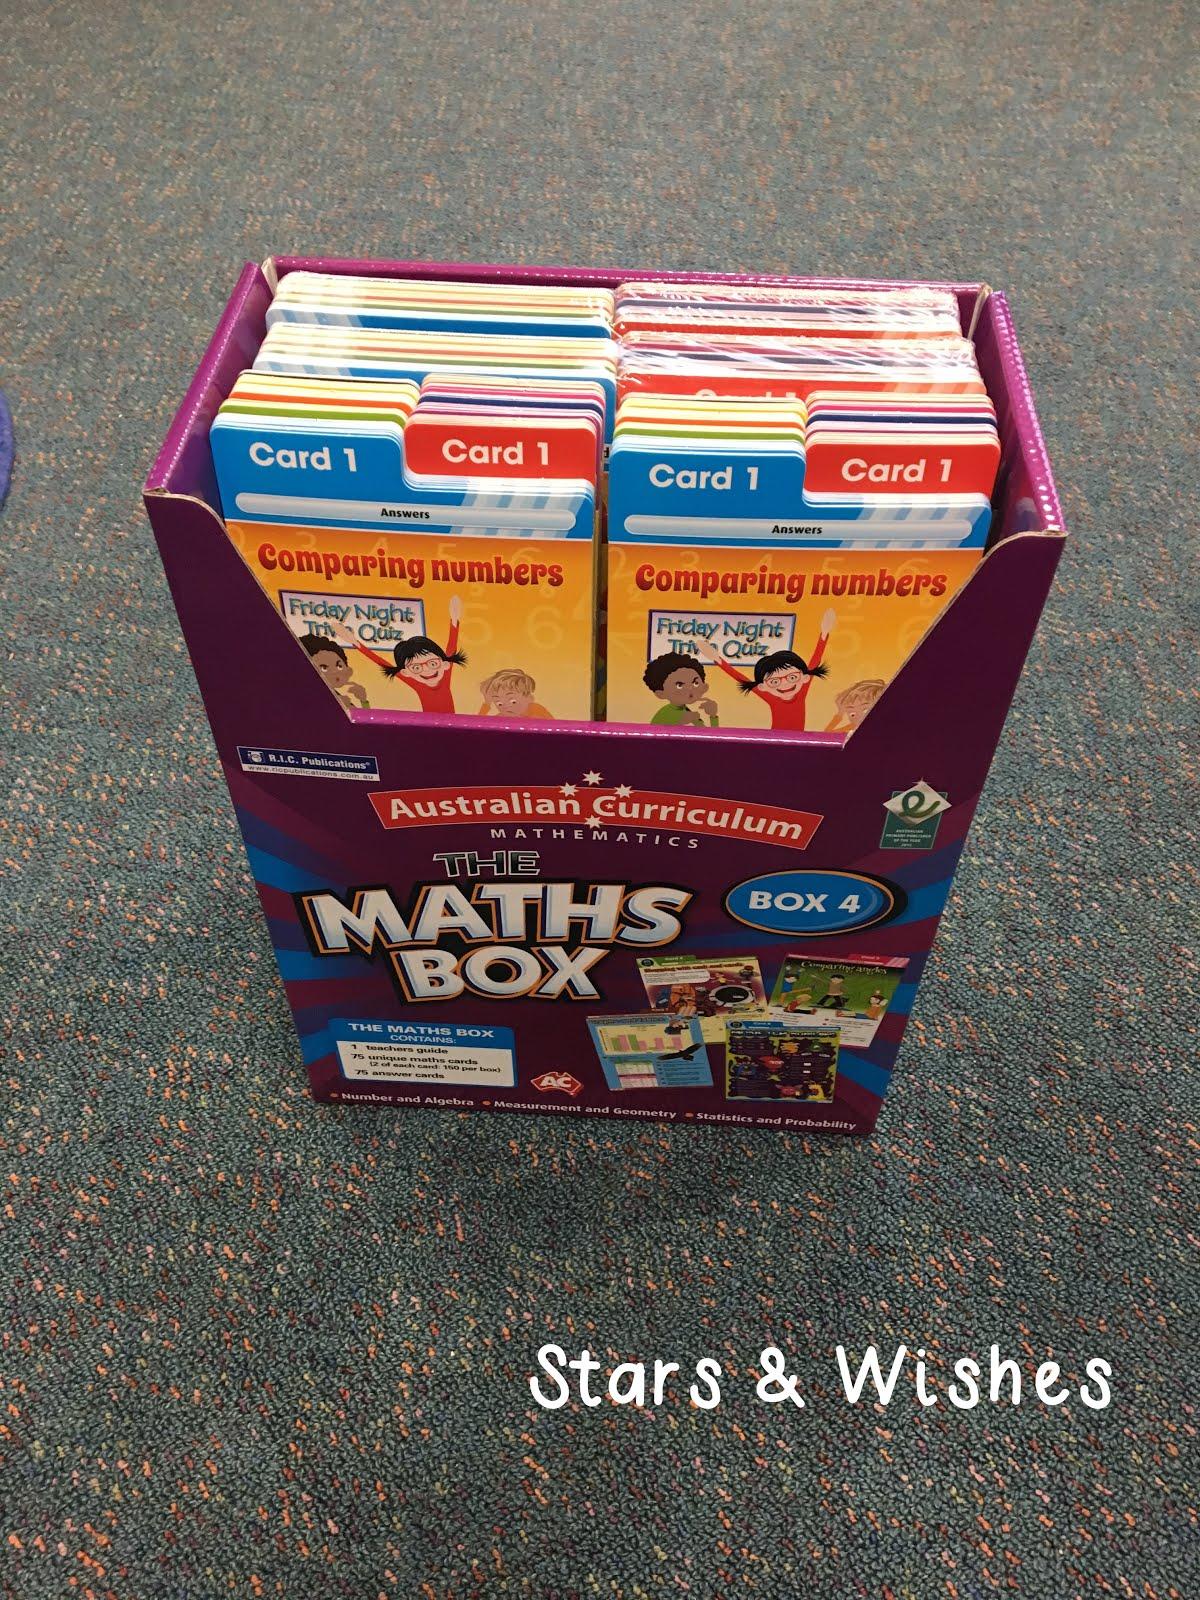 super star math worksheet answers math worksheets 7th grade pre algebra advanced super star. Black Bedroom Furniture Sets. Home Design Ideas